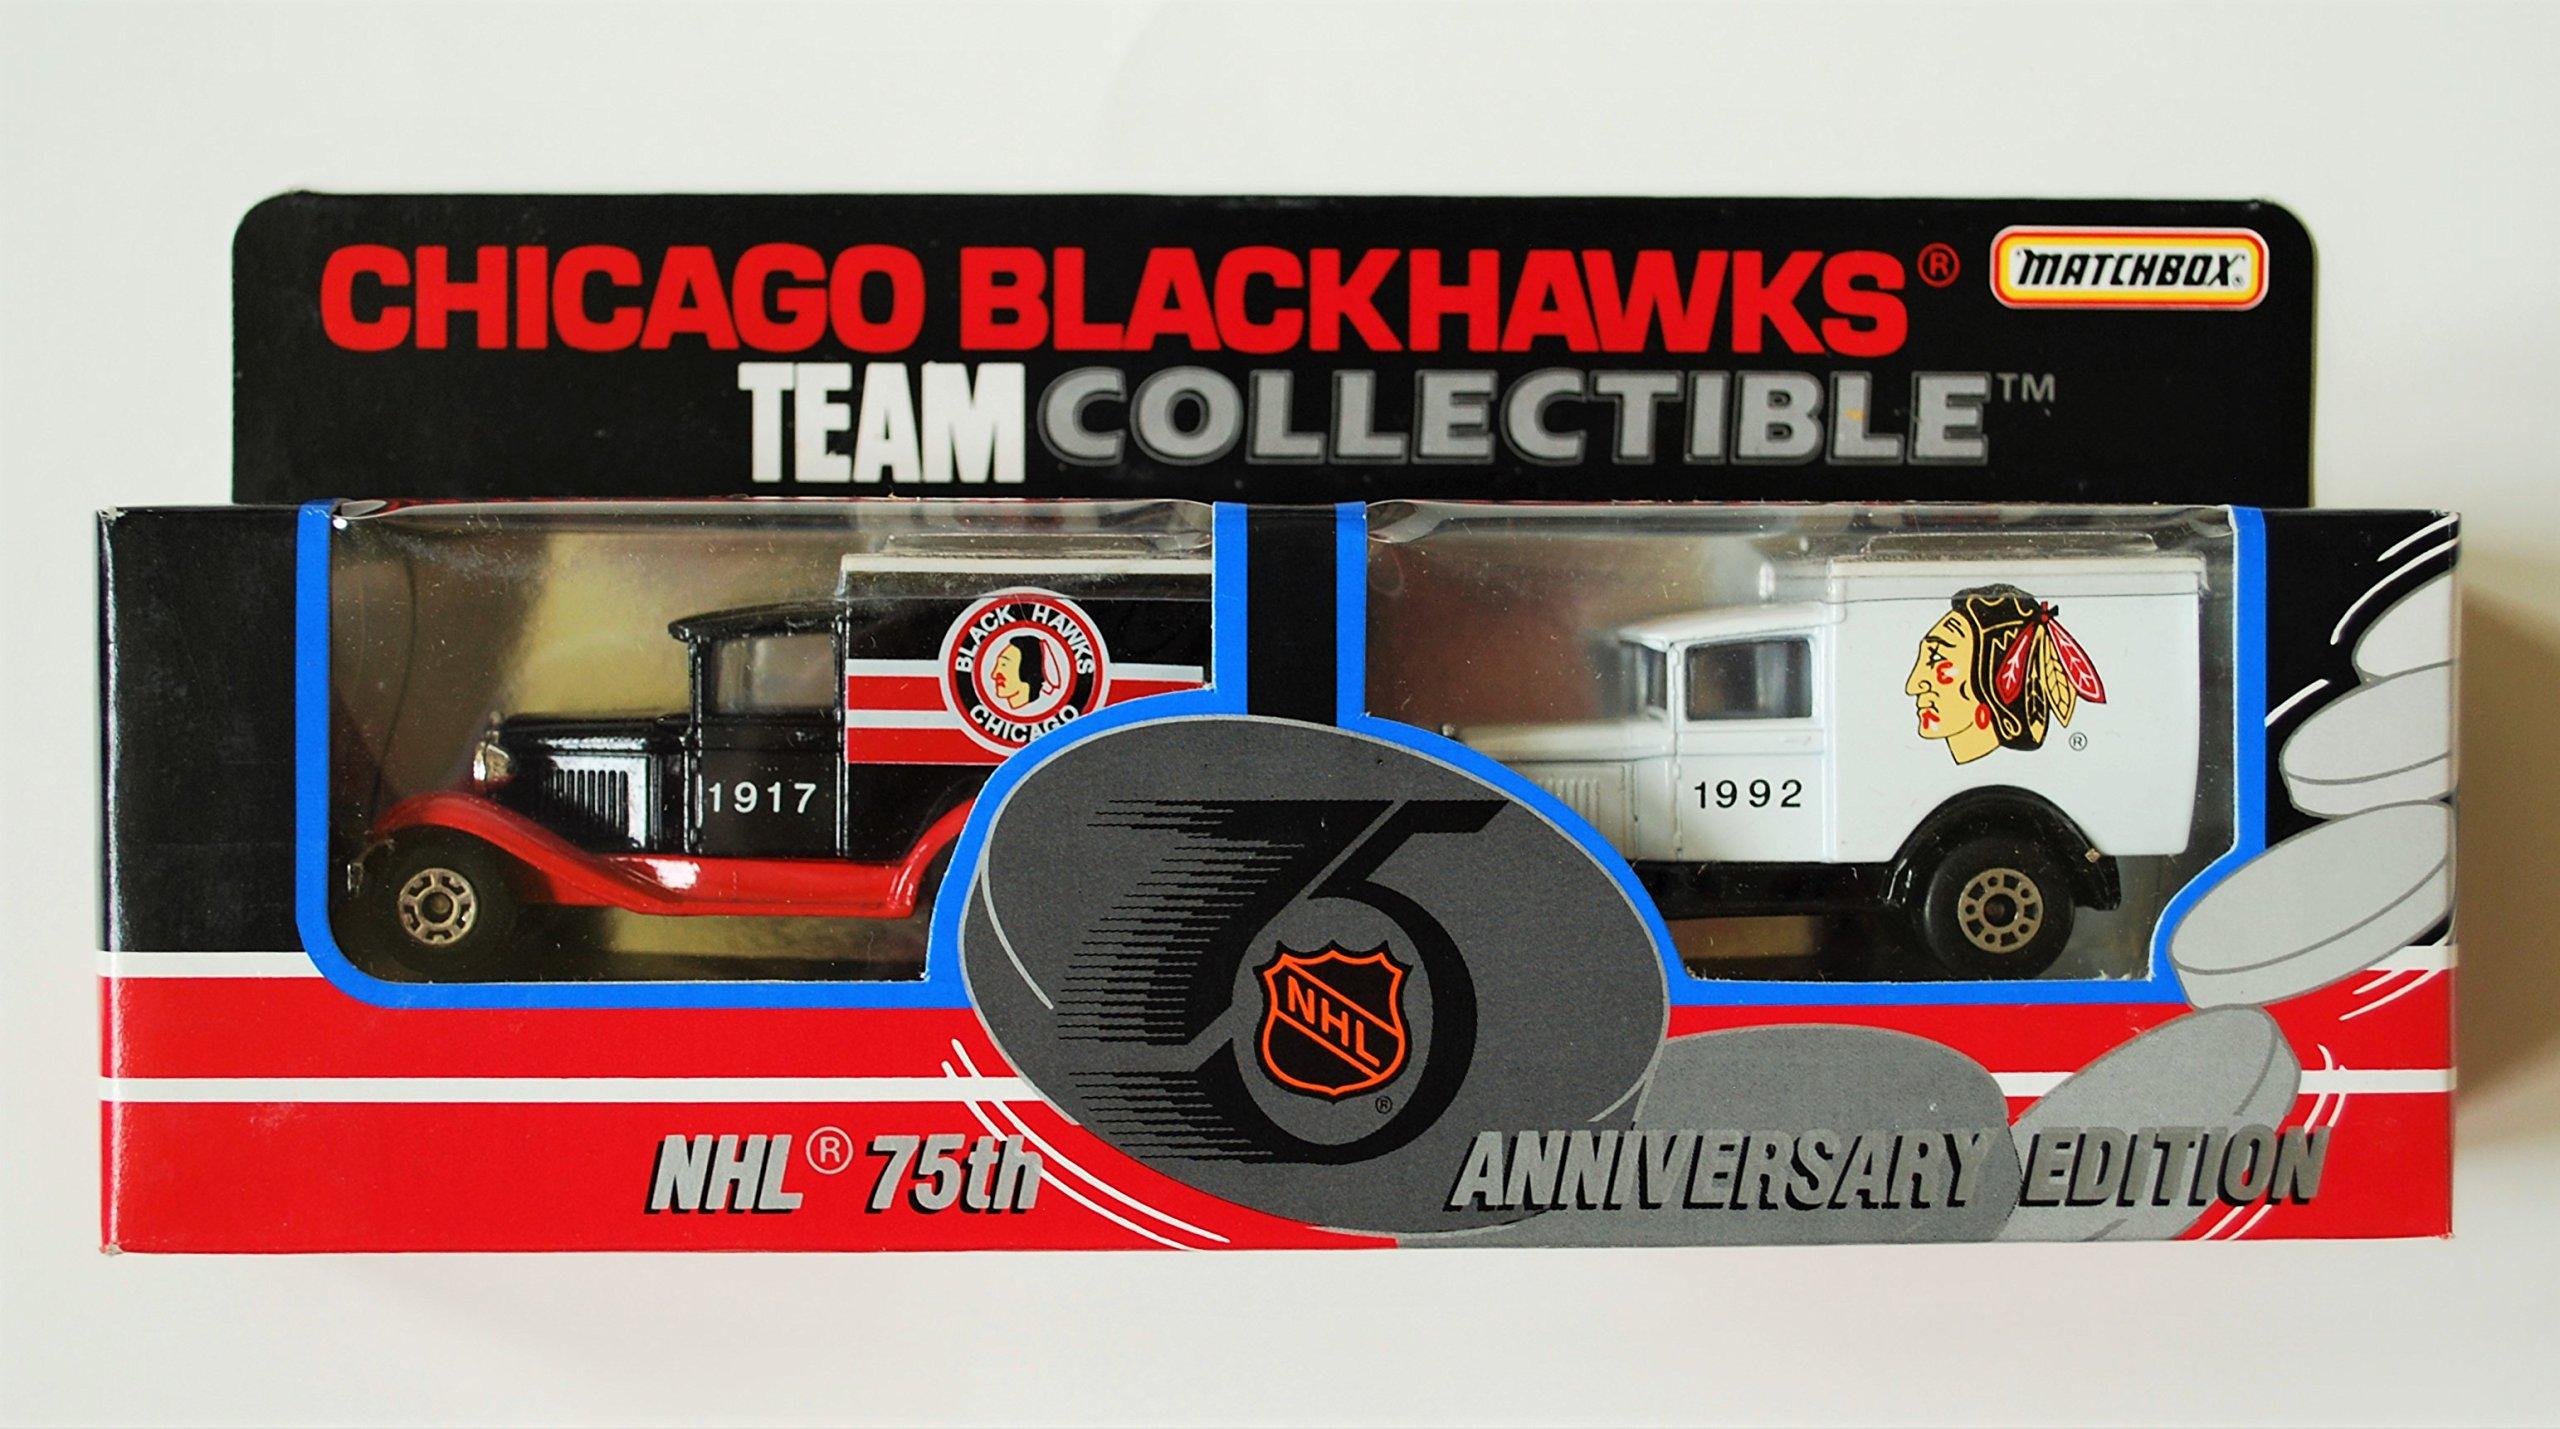 1992 Matchbox NHL Team Collectible 1:64 Scale Die Cast 2 Piece Truck Set CHICAGO BLACKHAWKS